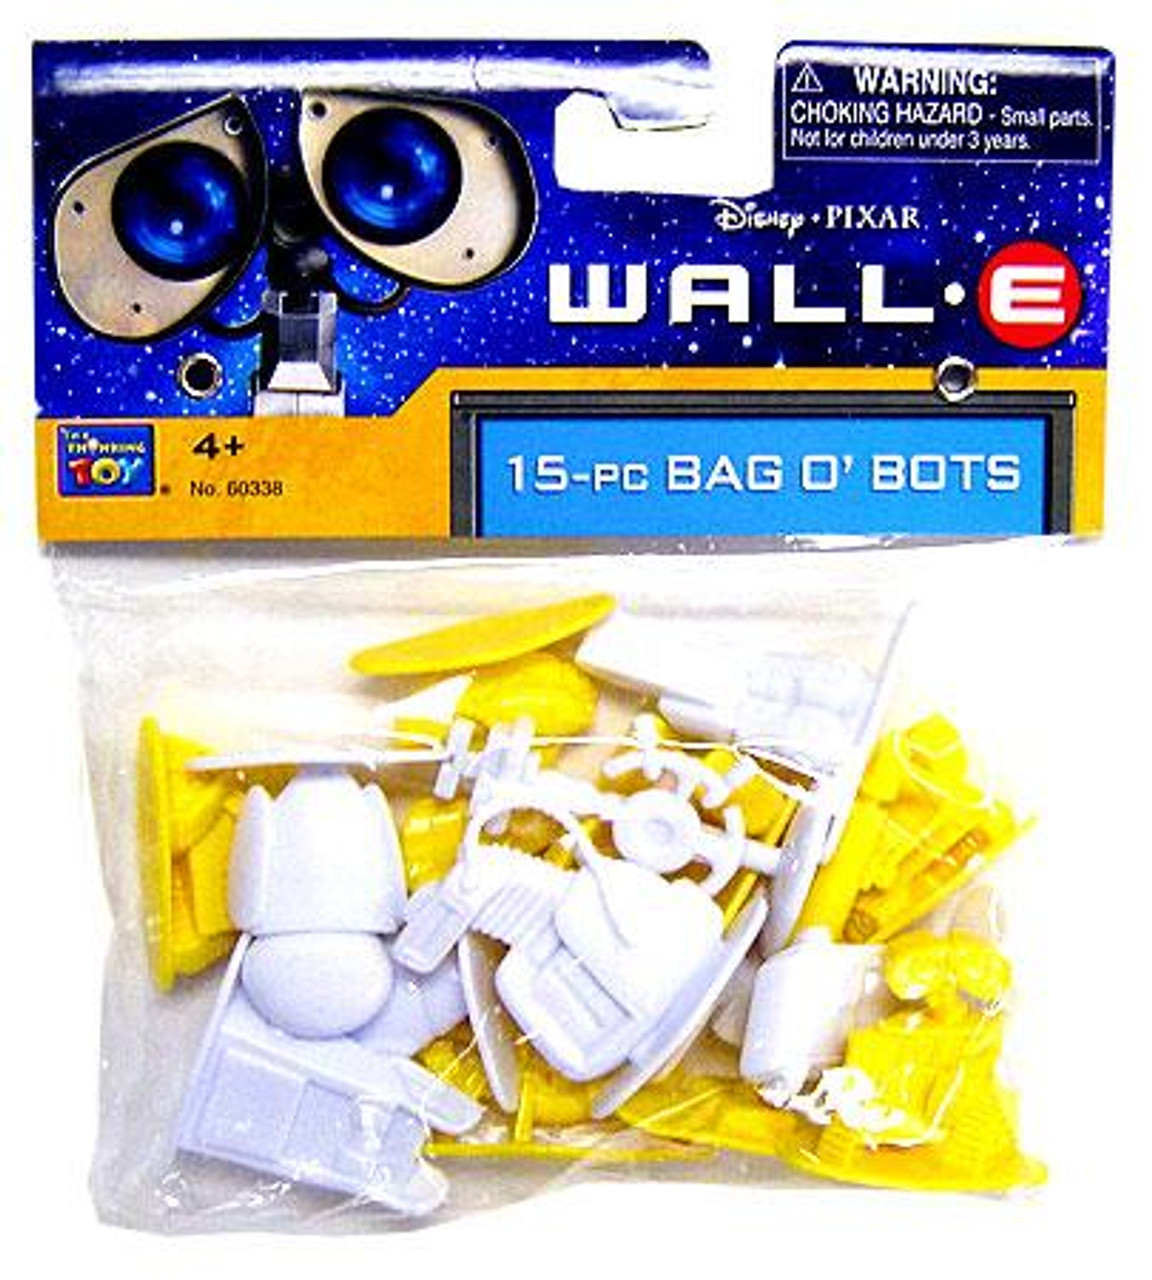 Disney / Pixar Wall-E Bag-O-Bots